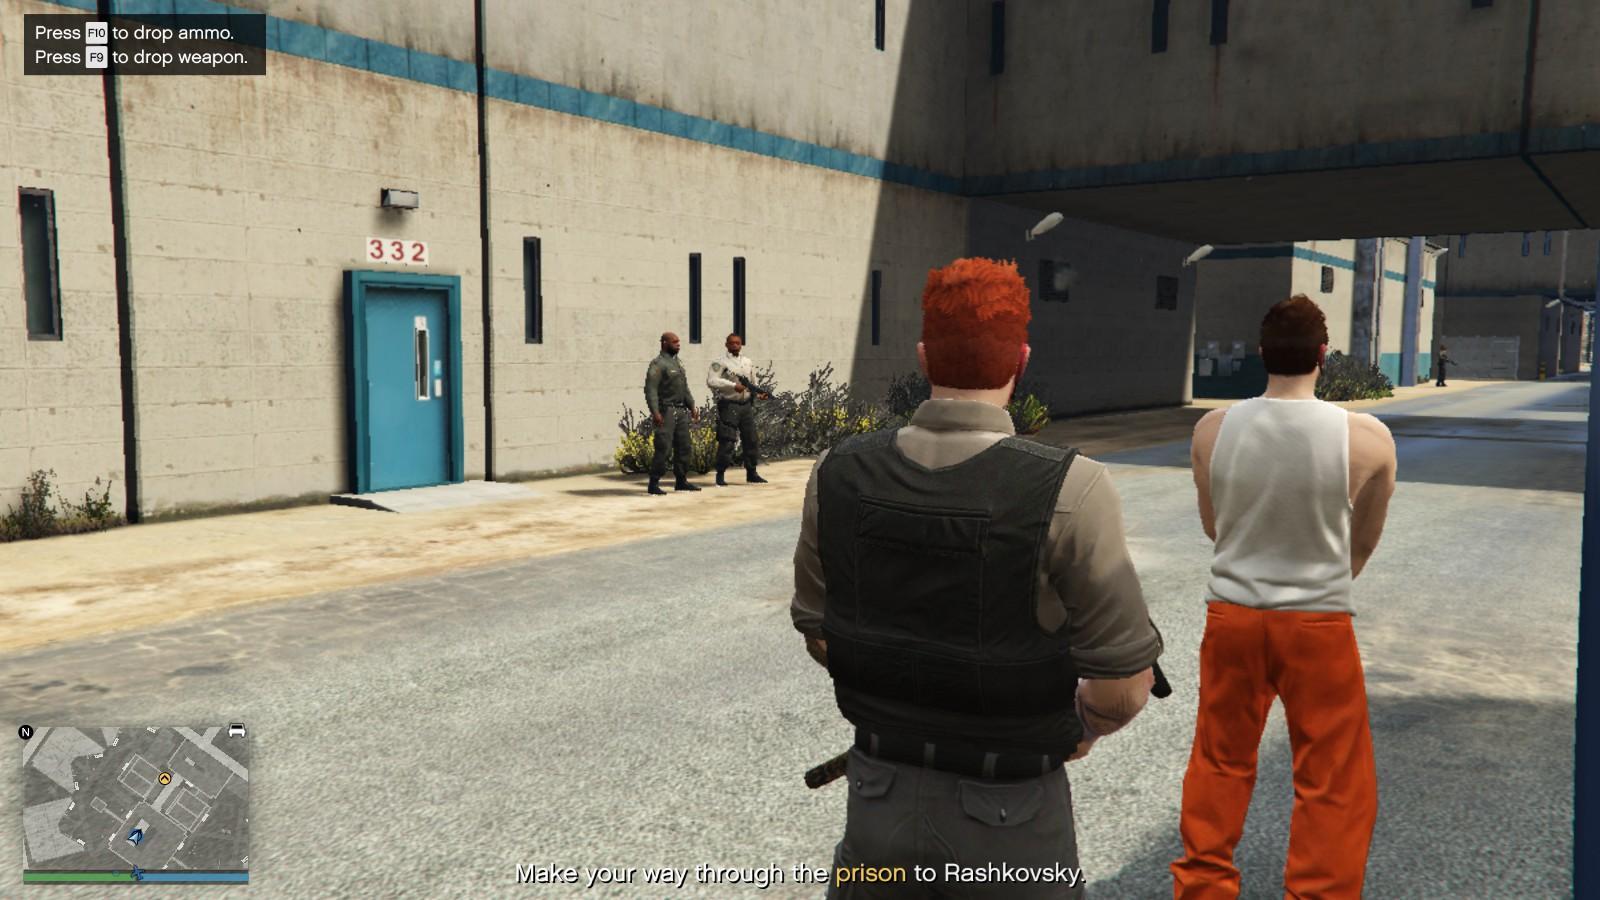 Gta 5 How To Get A Kuruma Into The Prison Prison Break Heist Finale